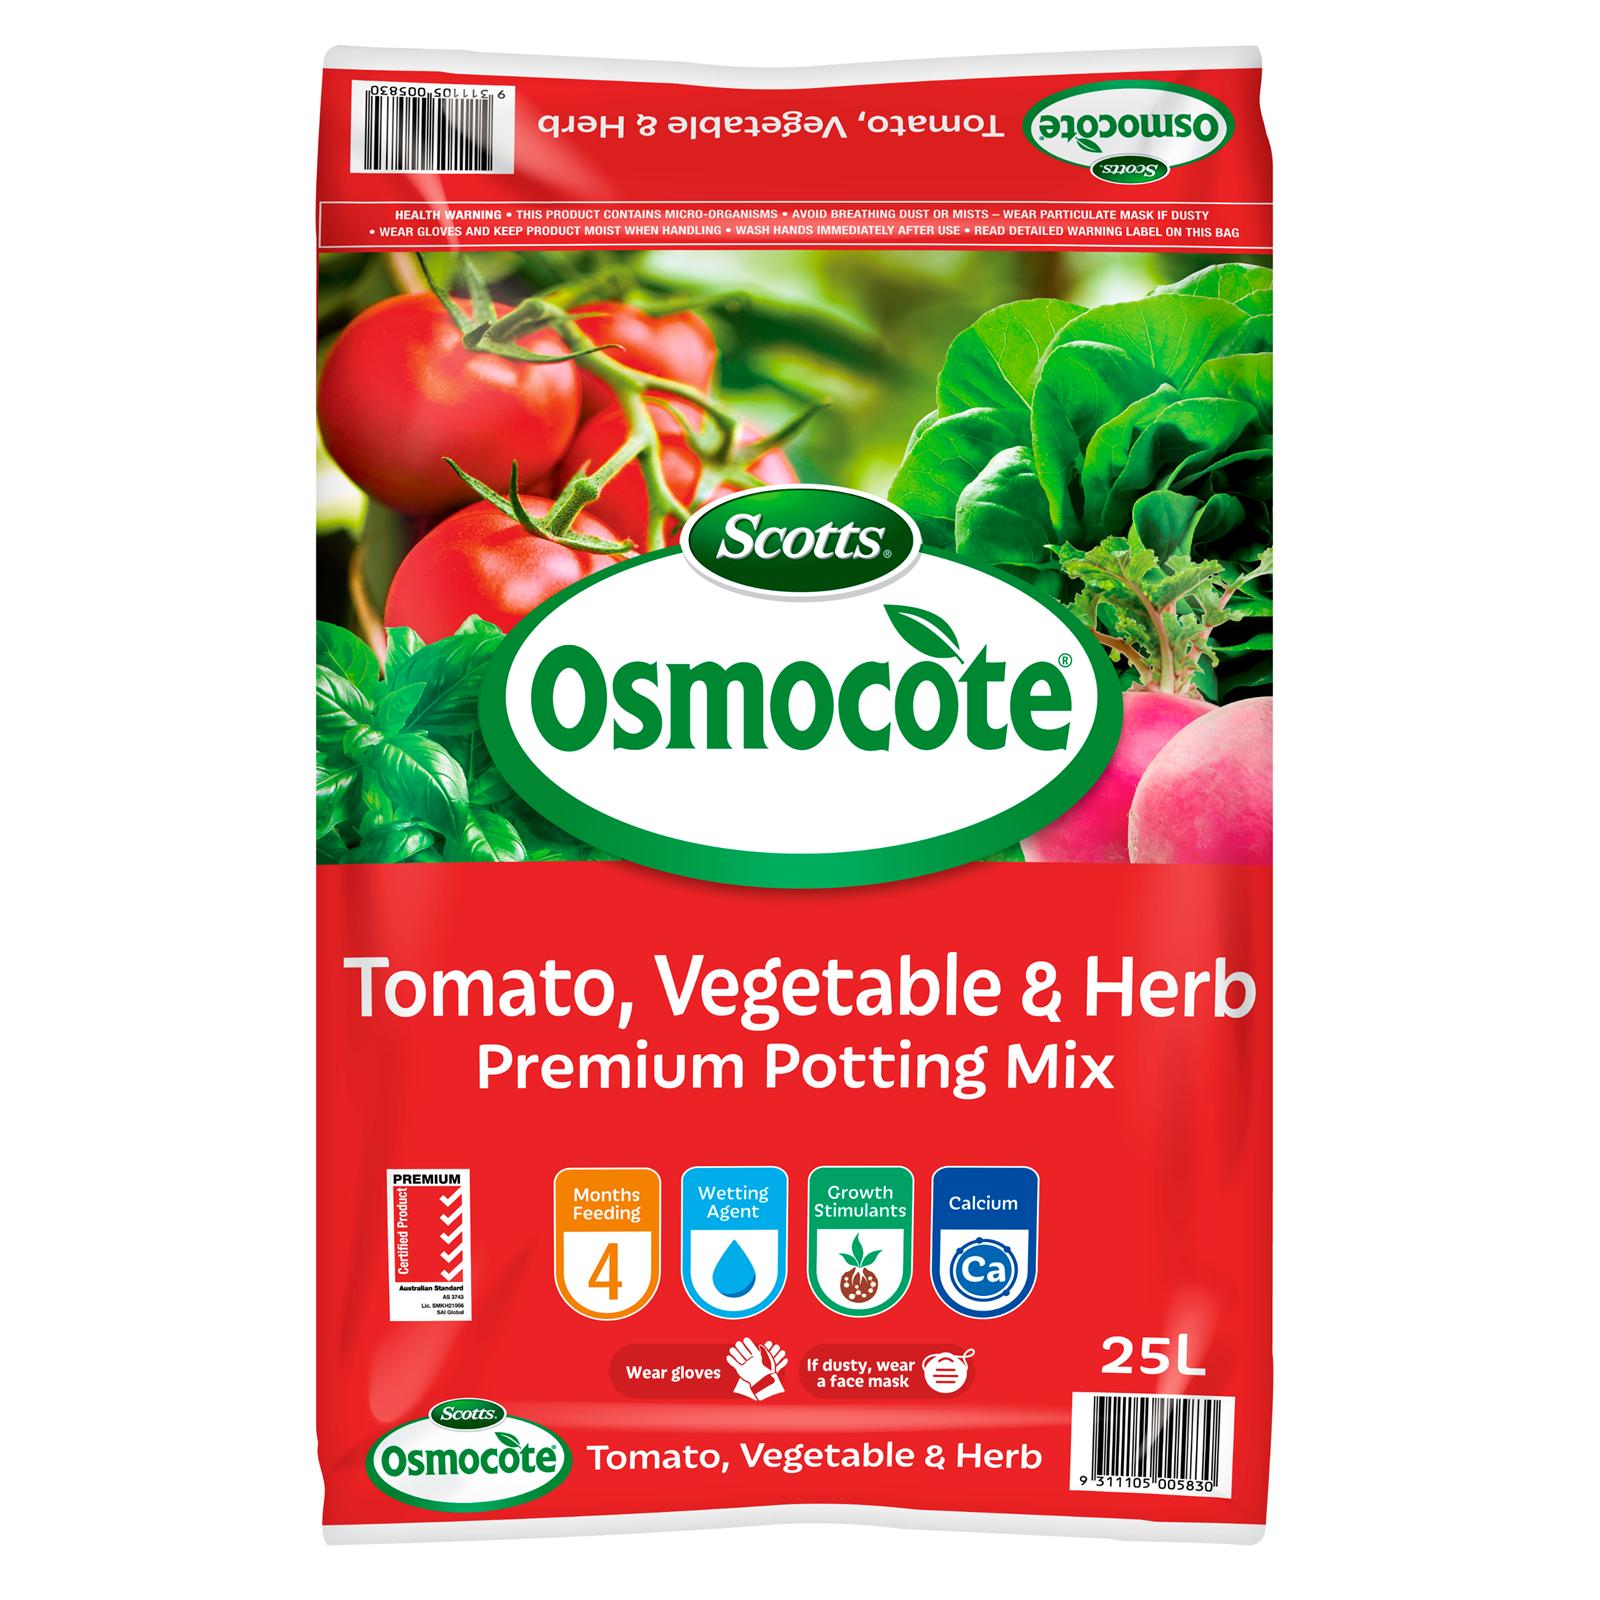 Scotts Osmocote 25L Tomato, Vegetable & Herb Premium Potting Mix